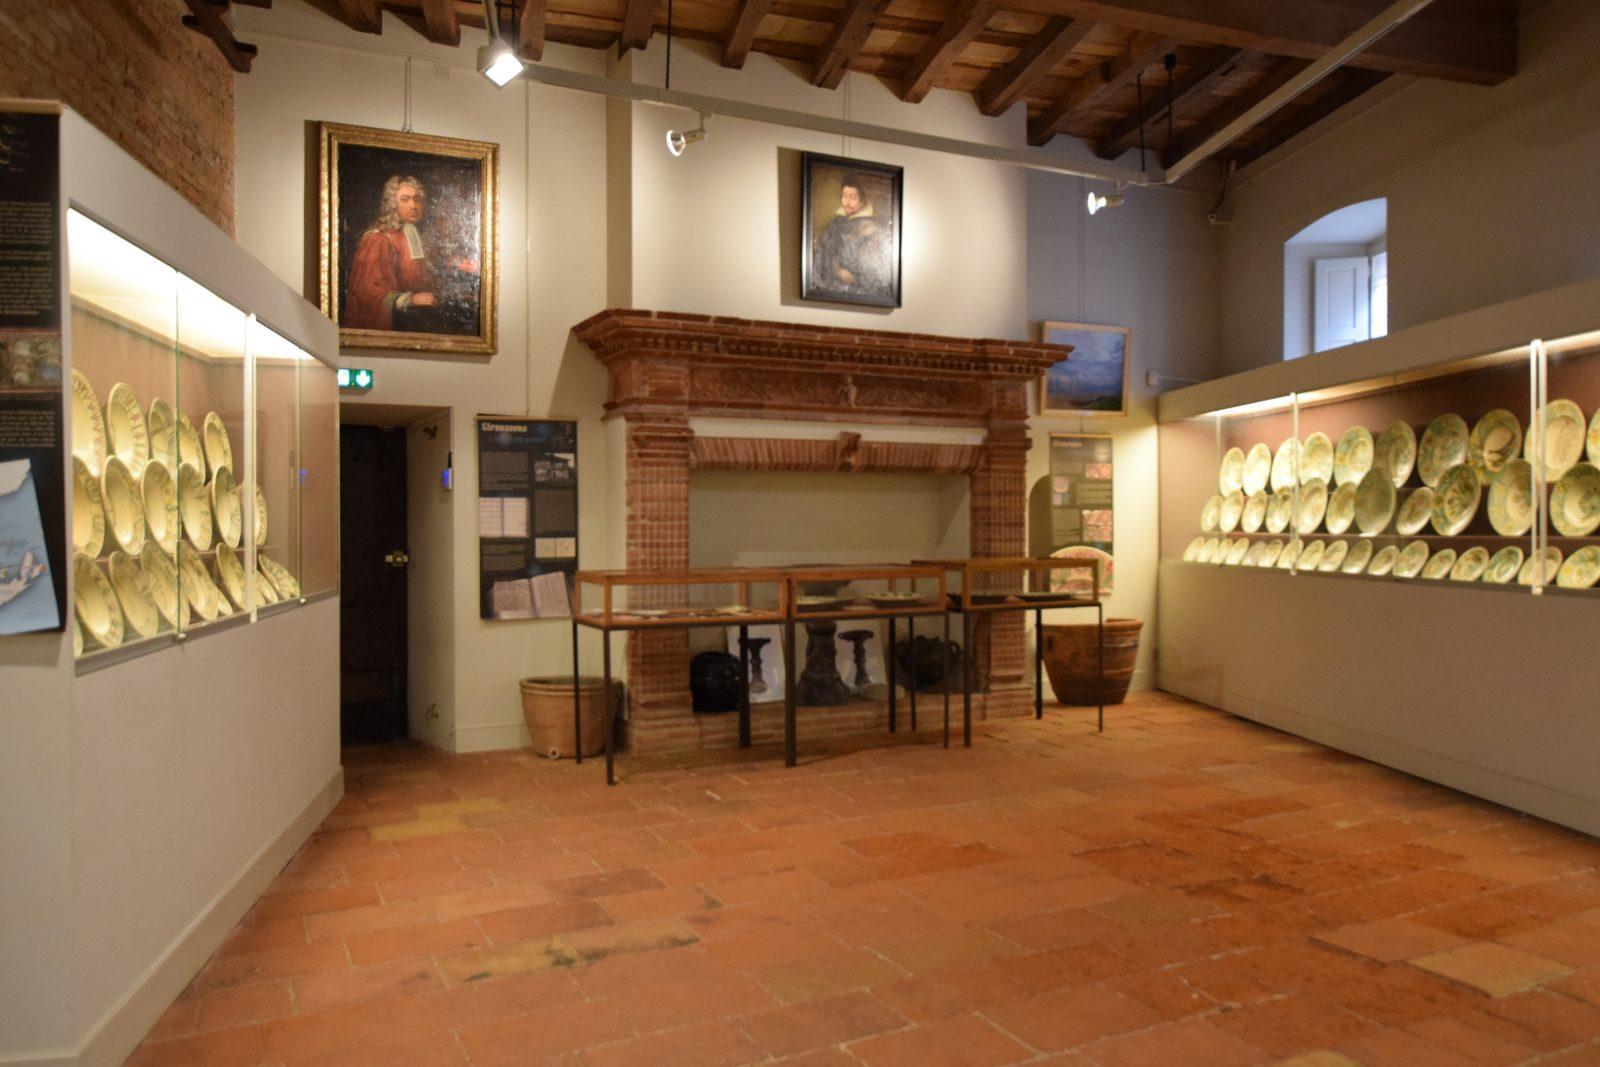 Musée du Pays rabastinois